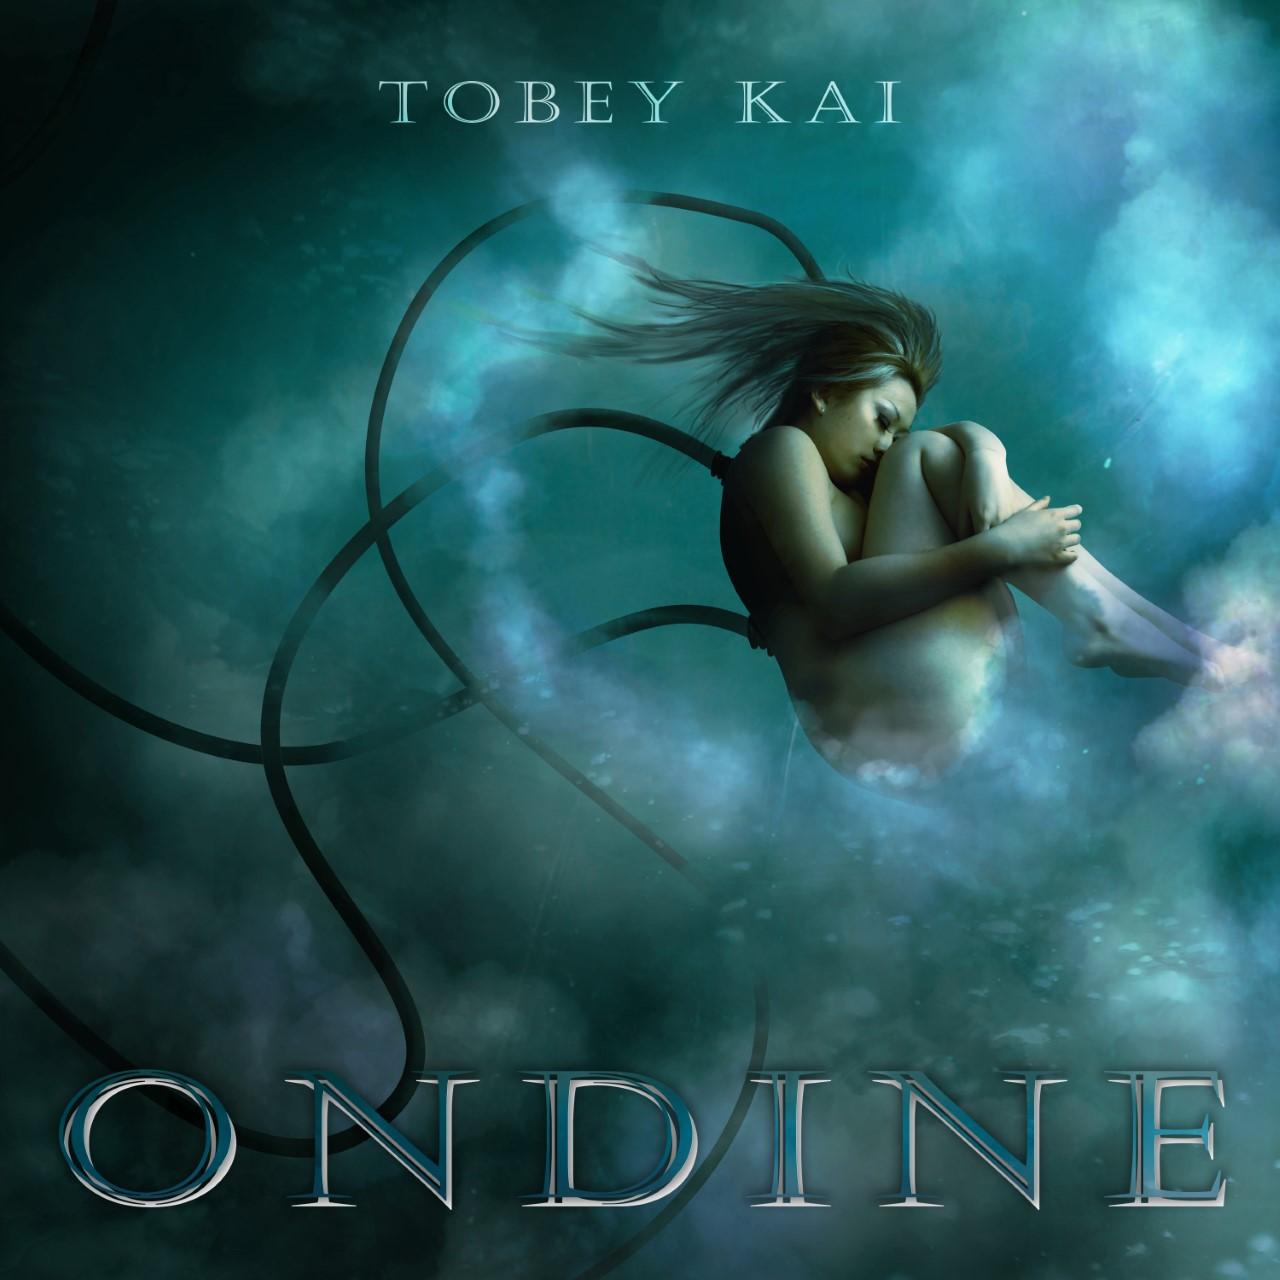 Listen to Ondine on    Spotify   .